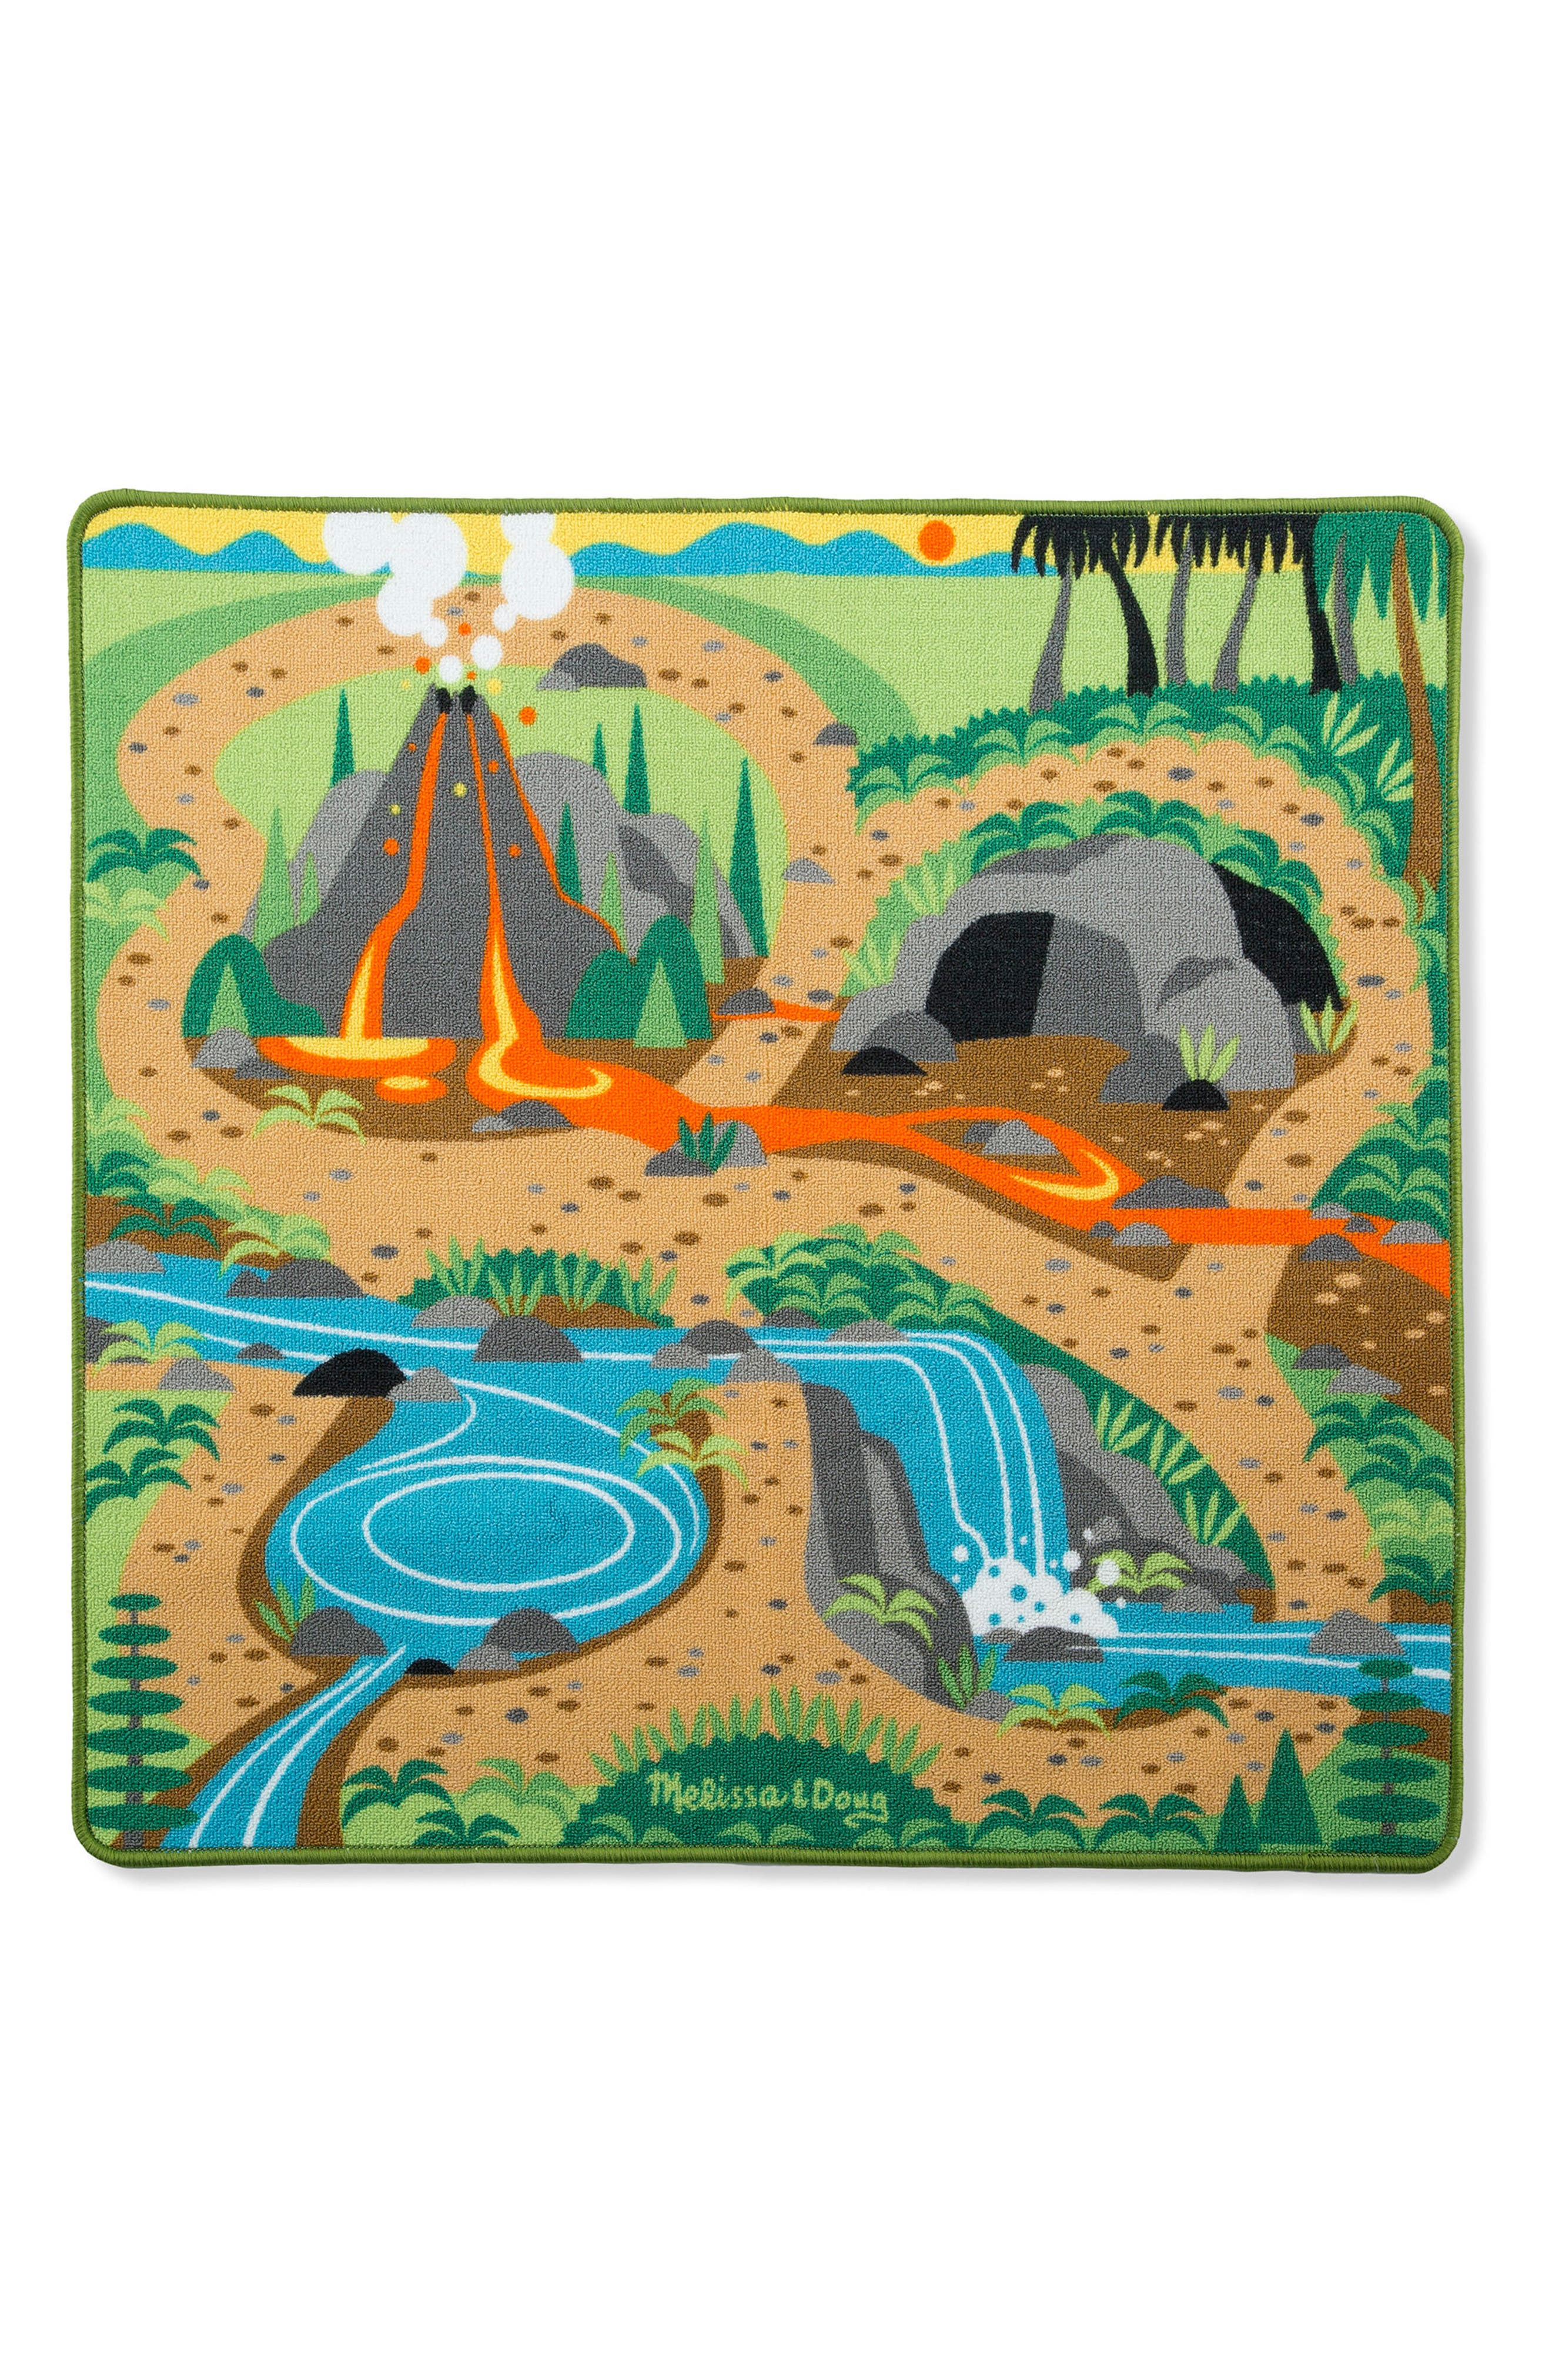 Prehistoric Playground Dinosaur Rug,                             Main thumbnail 1, color,                             GREEN